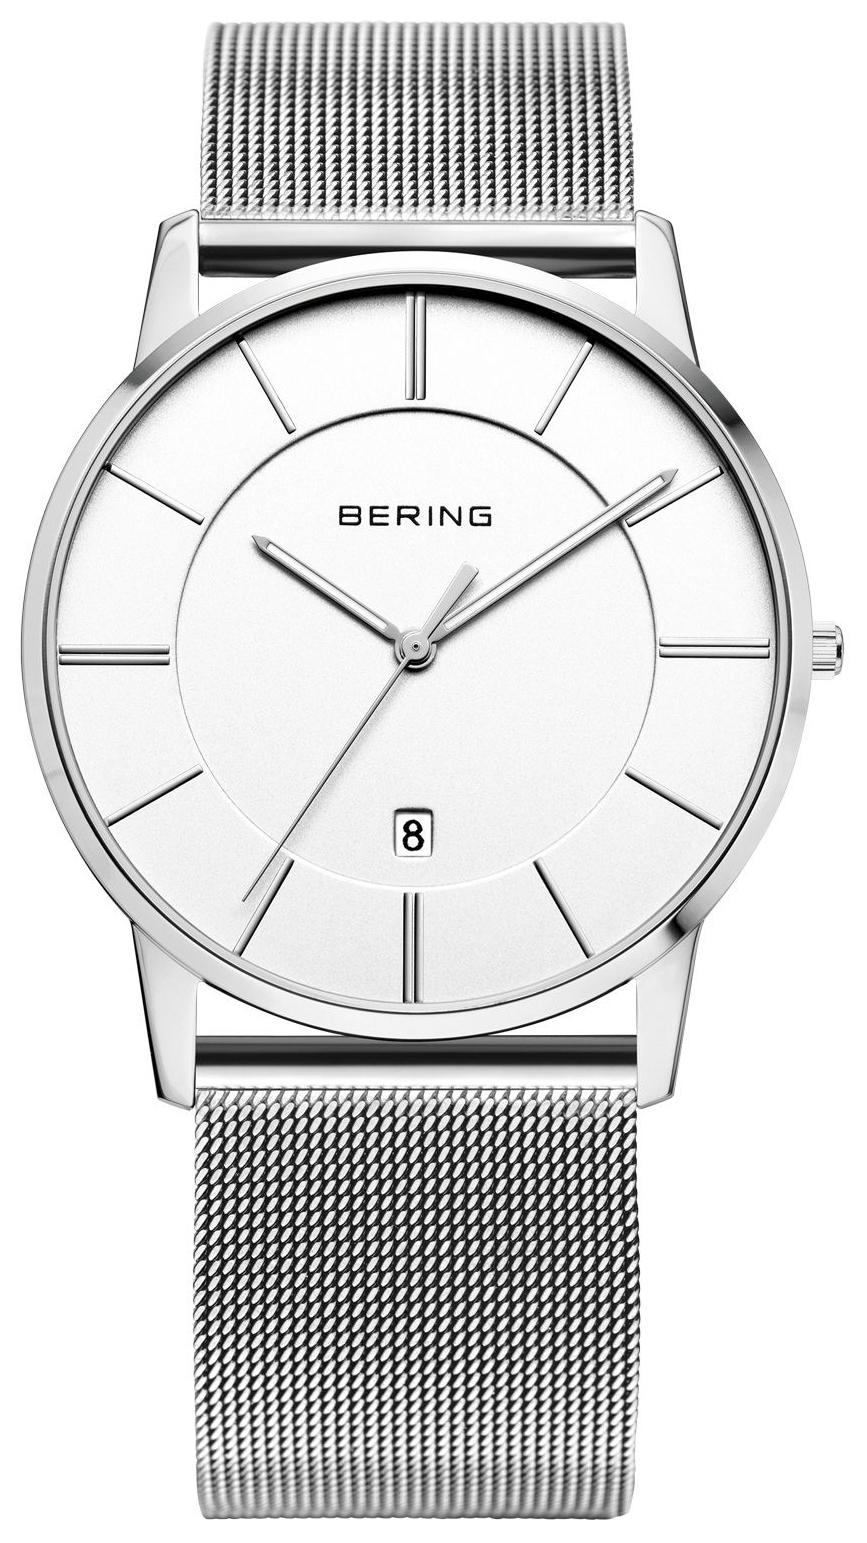 Bering Classic Herrklocka 13139-000 Vit/Stål Ø39 mm - Bering